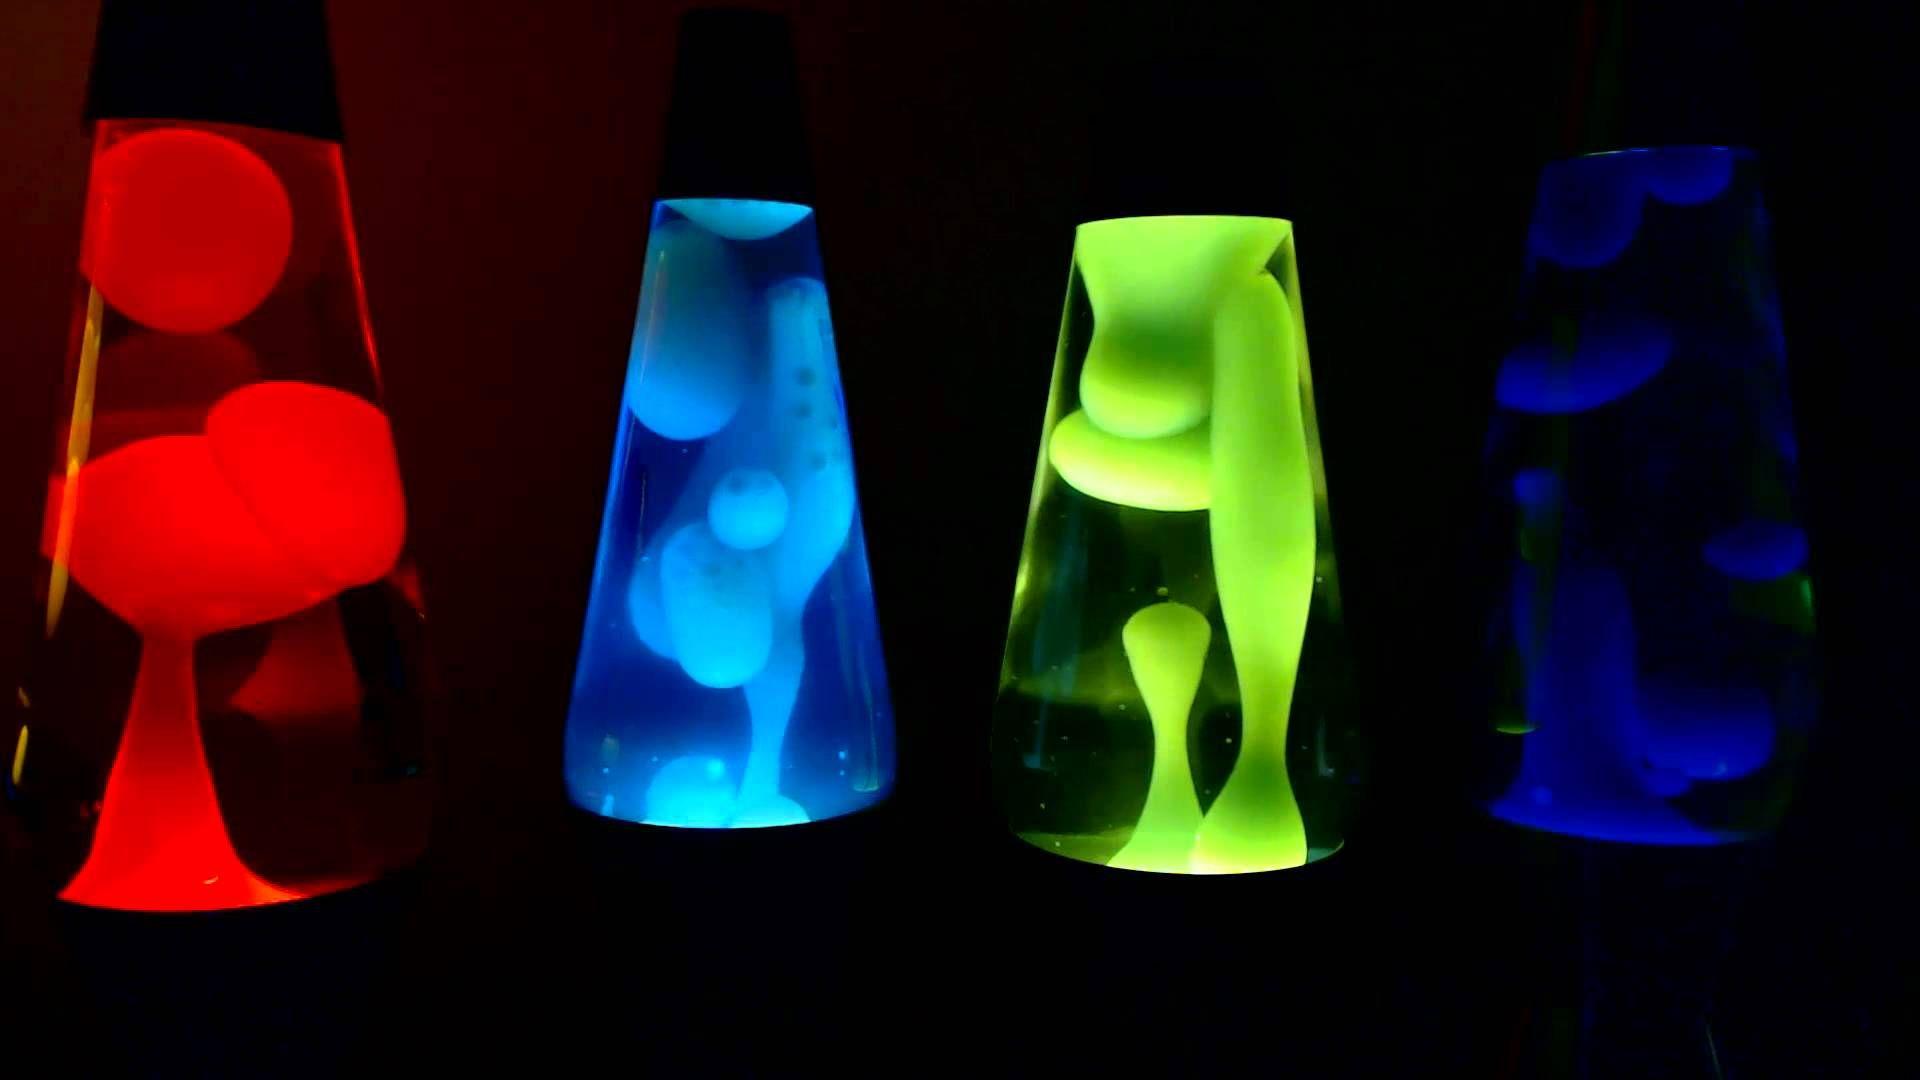 lava lamp background - Google Search | Cool Stuff | Pinterest | Lava ... for Moving Lava Lamp Background  181pct